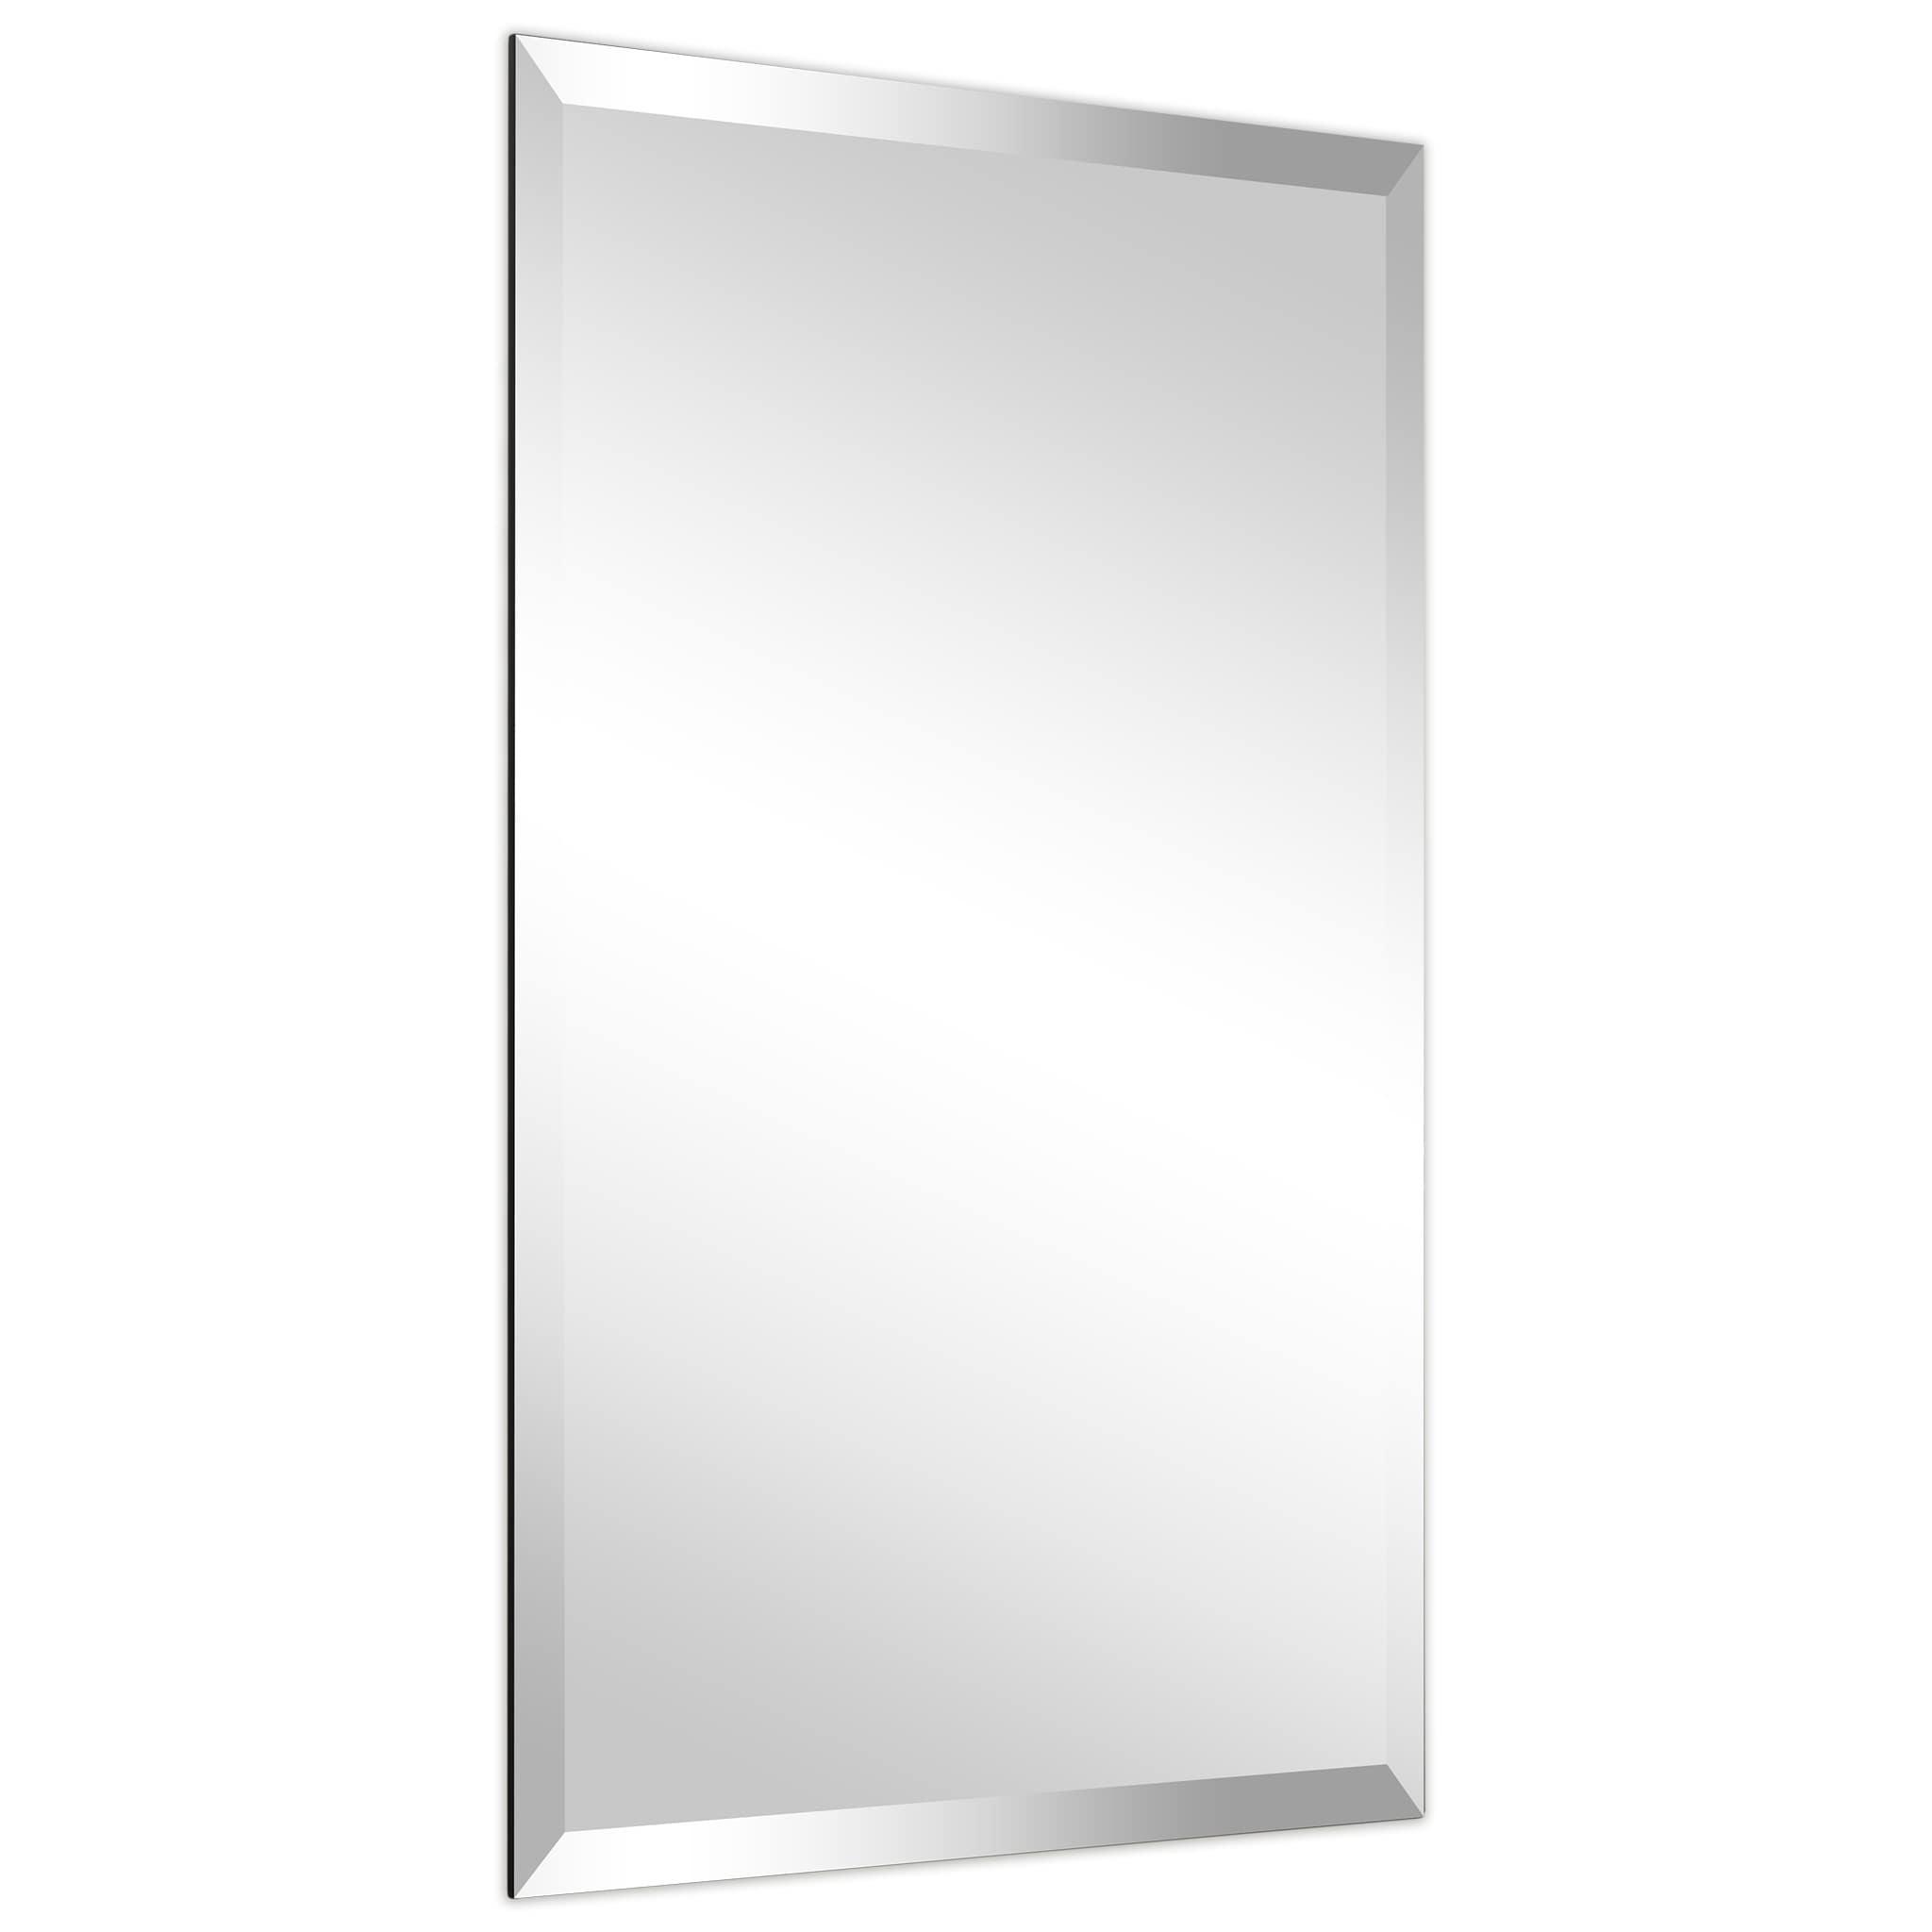 Shop Frameless Beveled Prism Wall Mirror Bathroom Vanity Bedroom Mirror 1 Beveled Edge Clear On Sale Overstock 24220389